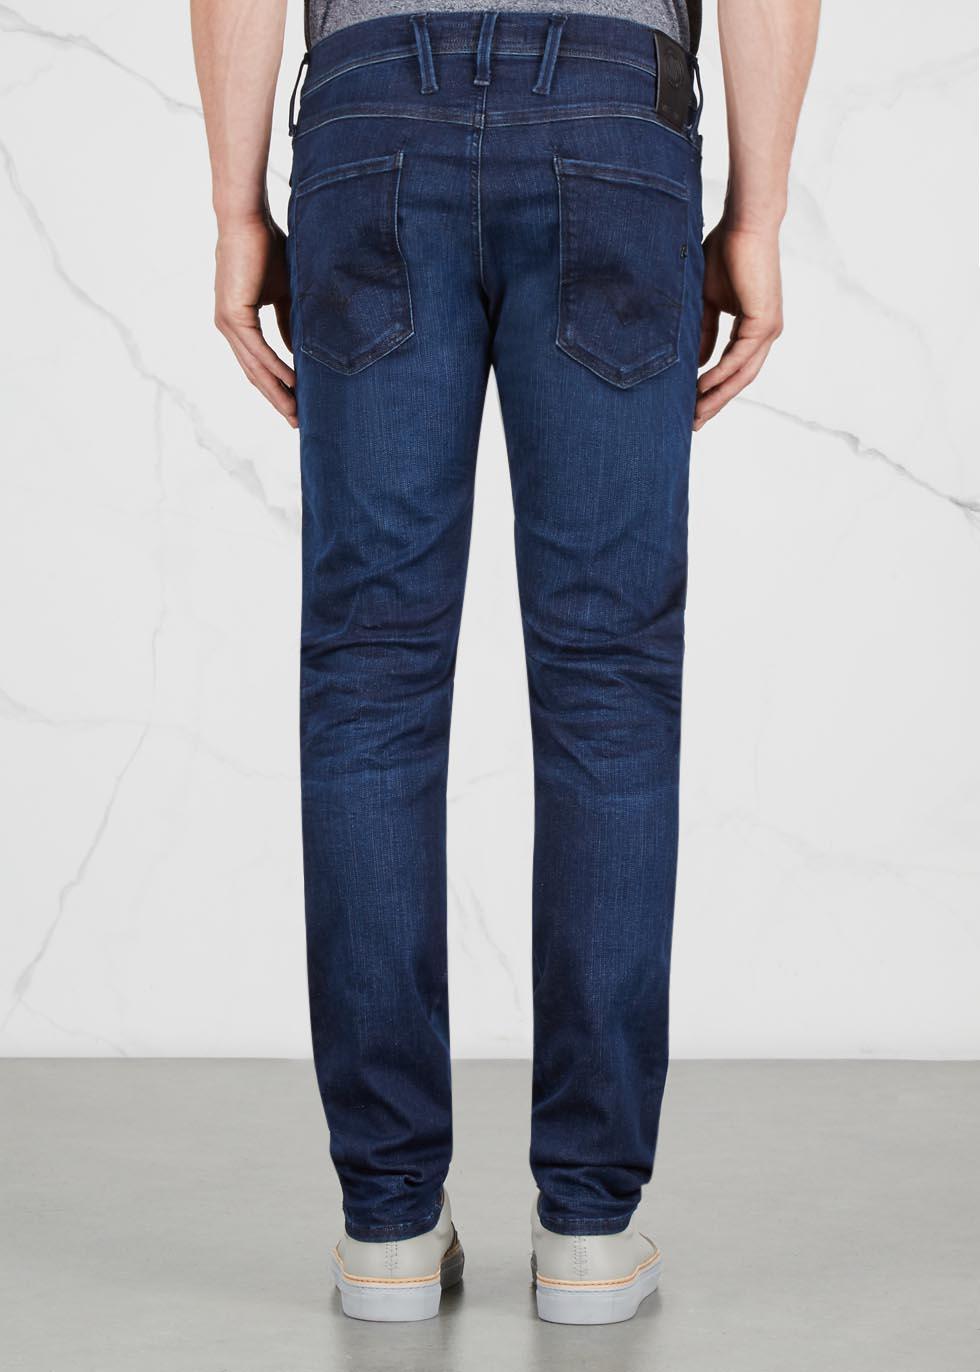 Anbass Hyperflex indigo slim-leg jeans - Replay